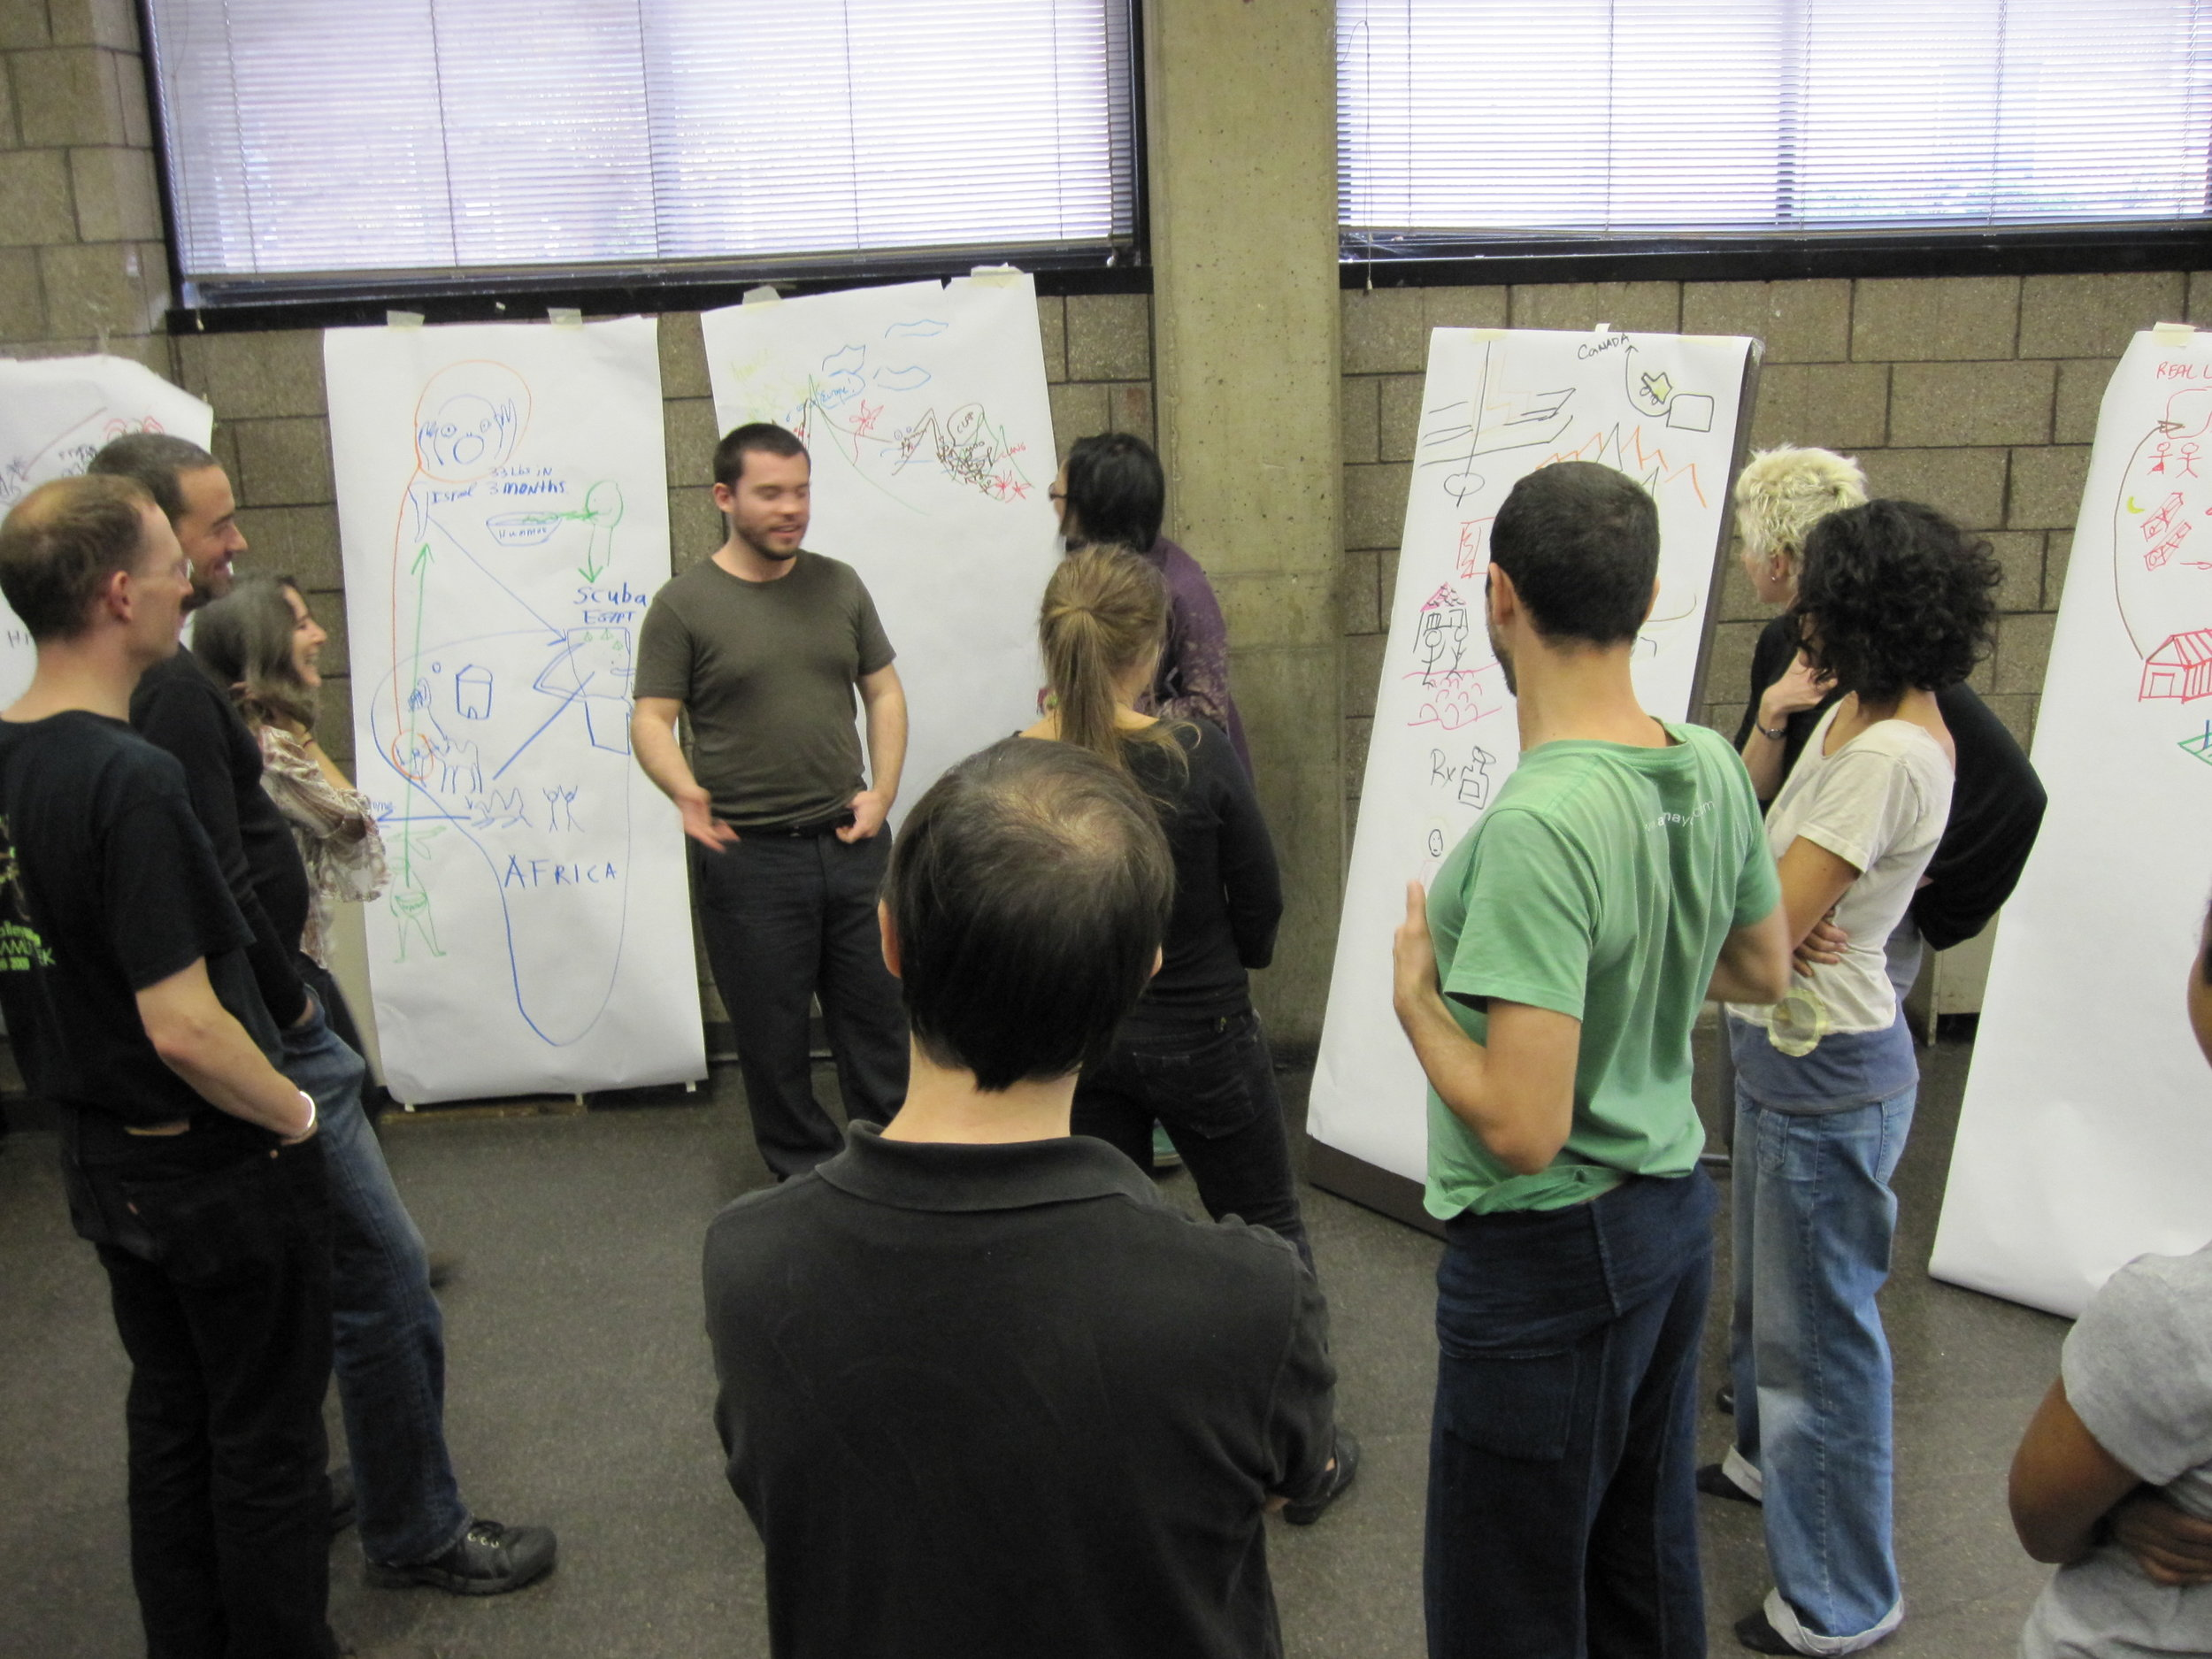 symposium-doing-2_4315649388_o.jpg